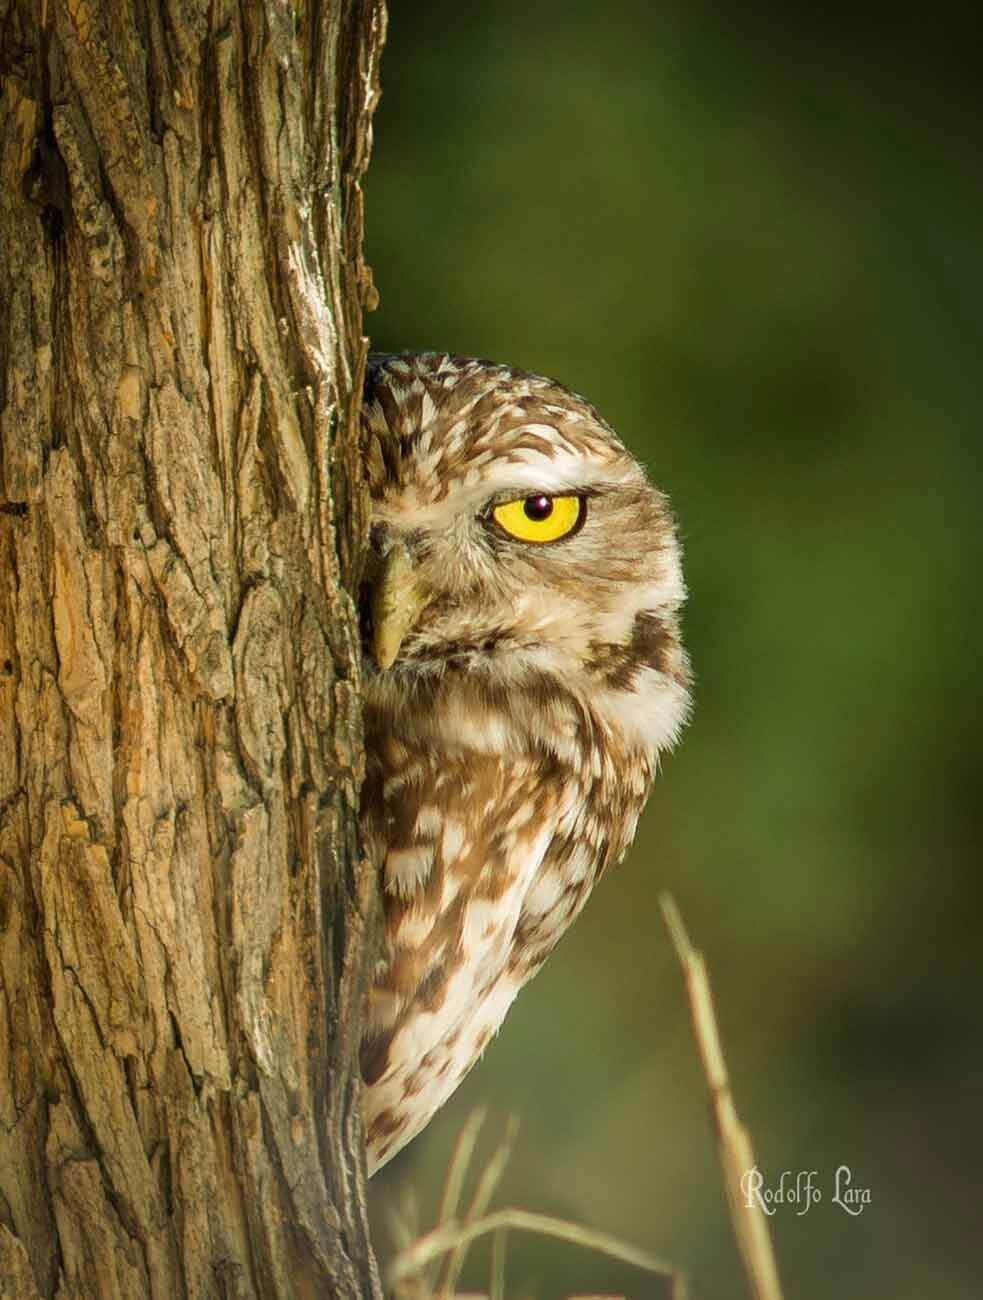 Rodolfo Lara de la Fuente - Owl